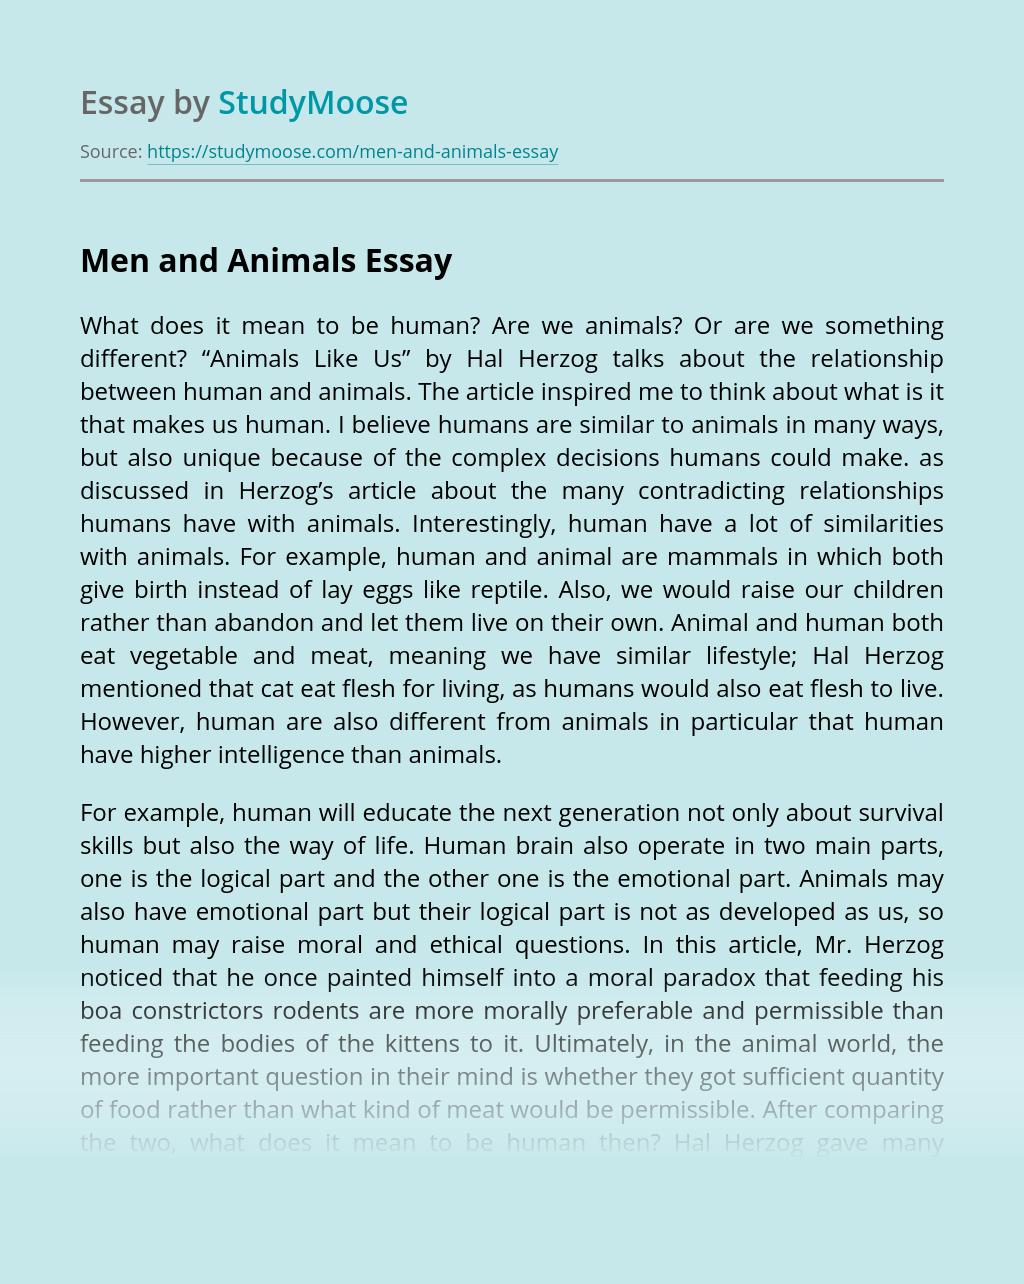 Men and Animals